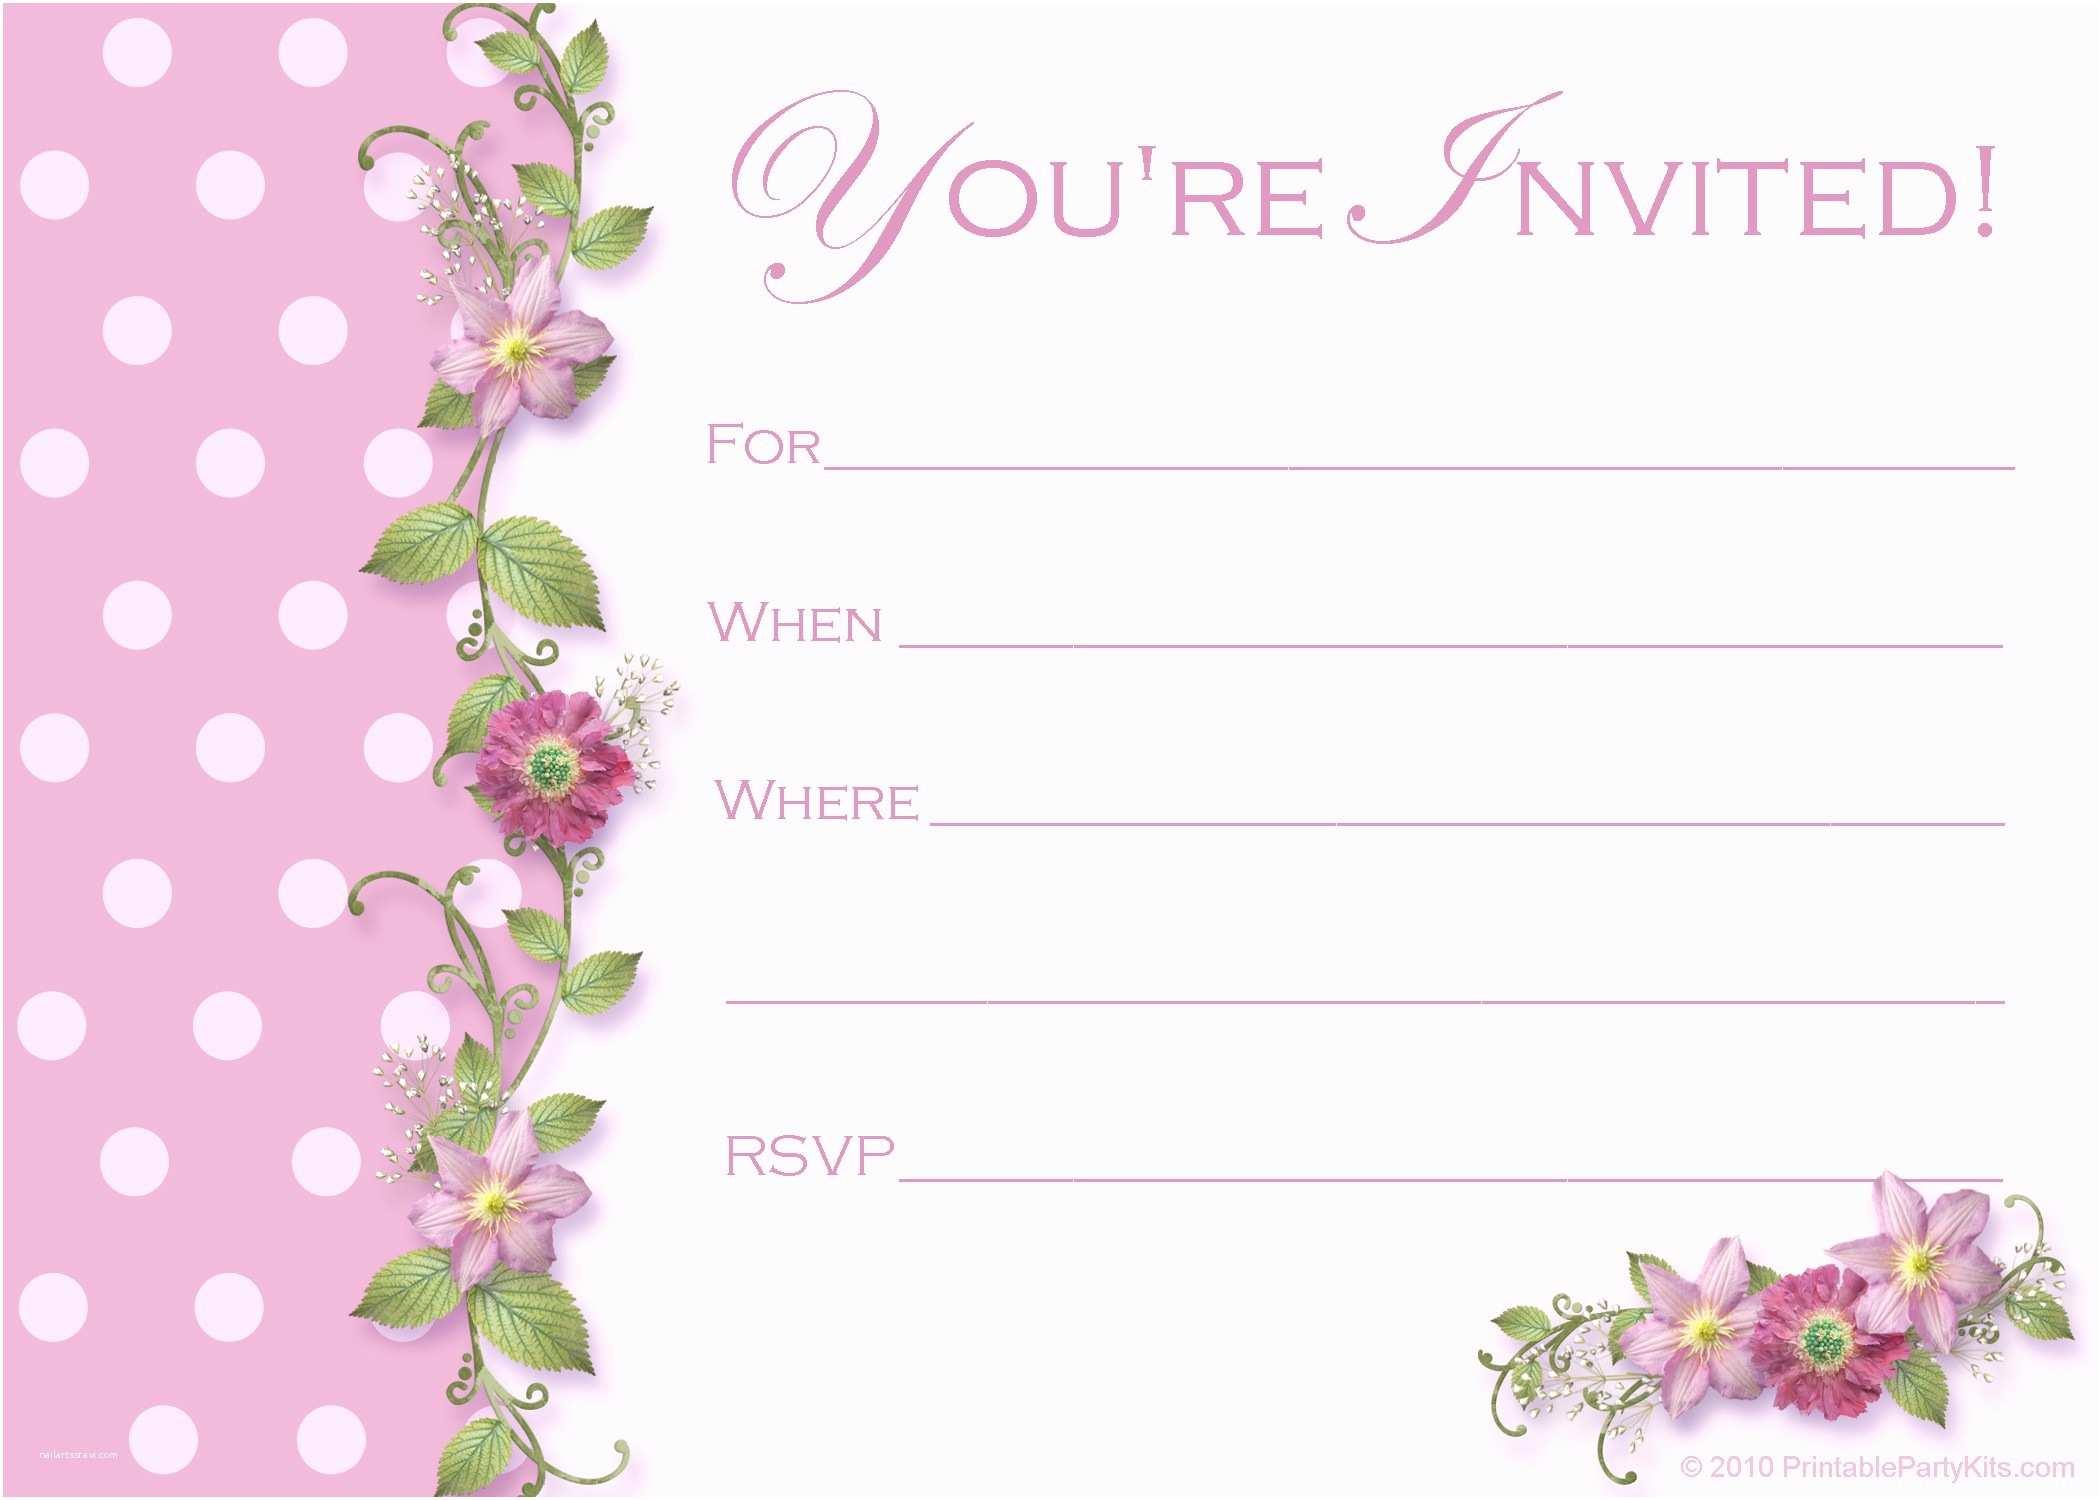 Free Party Invitation Templates Bowling Invitations